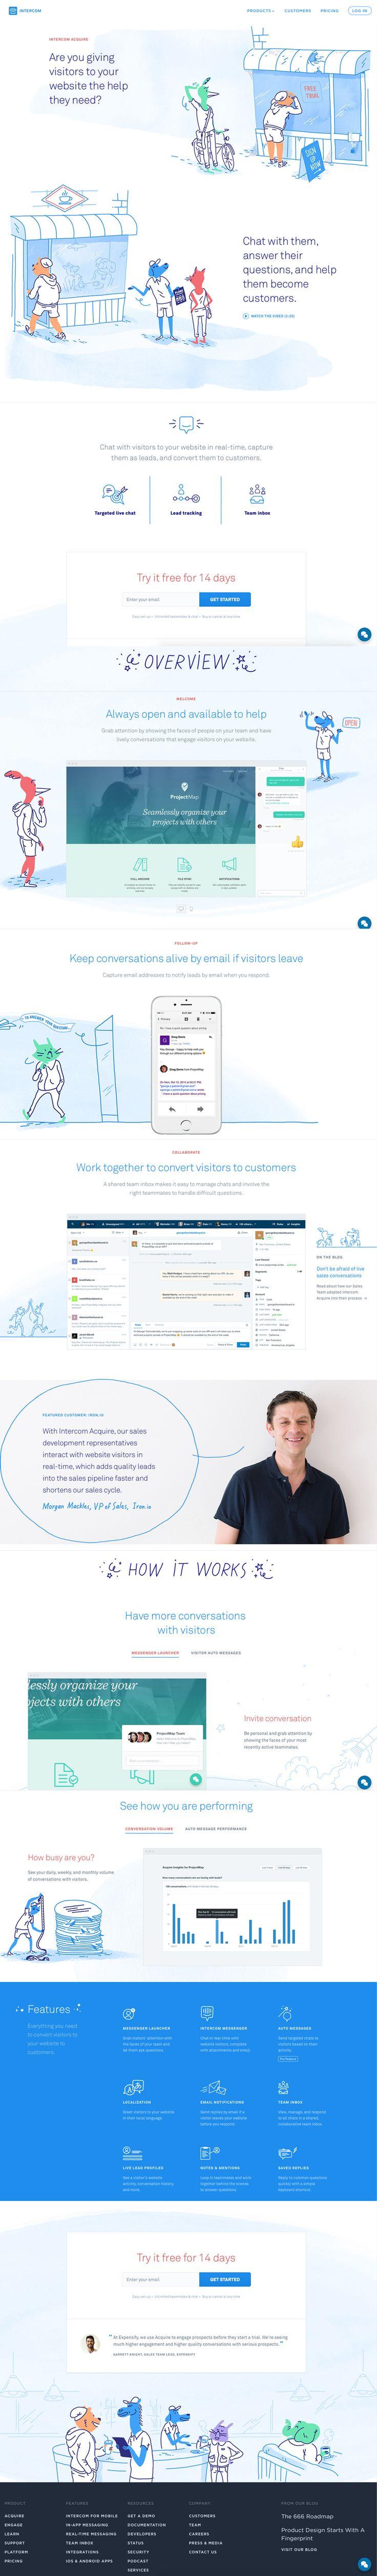 I love the use of integrating illustration in this website, intercom.io